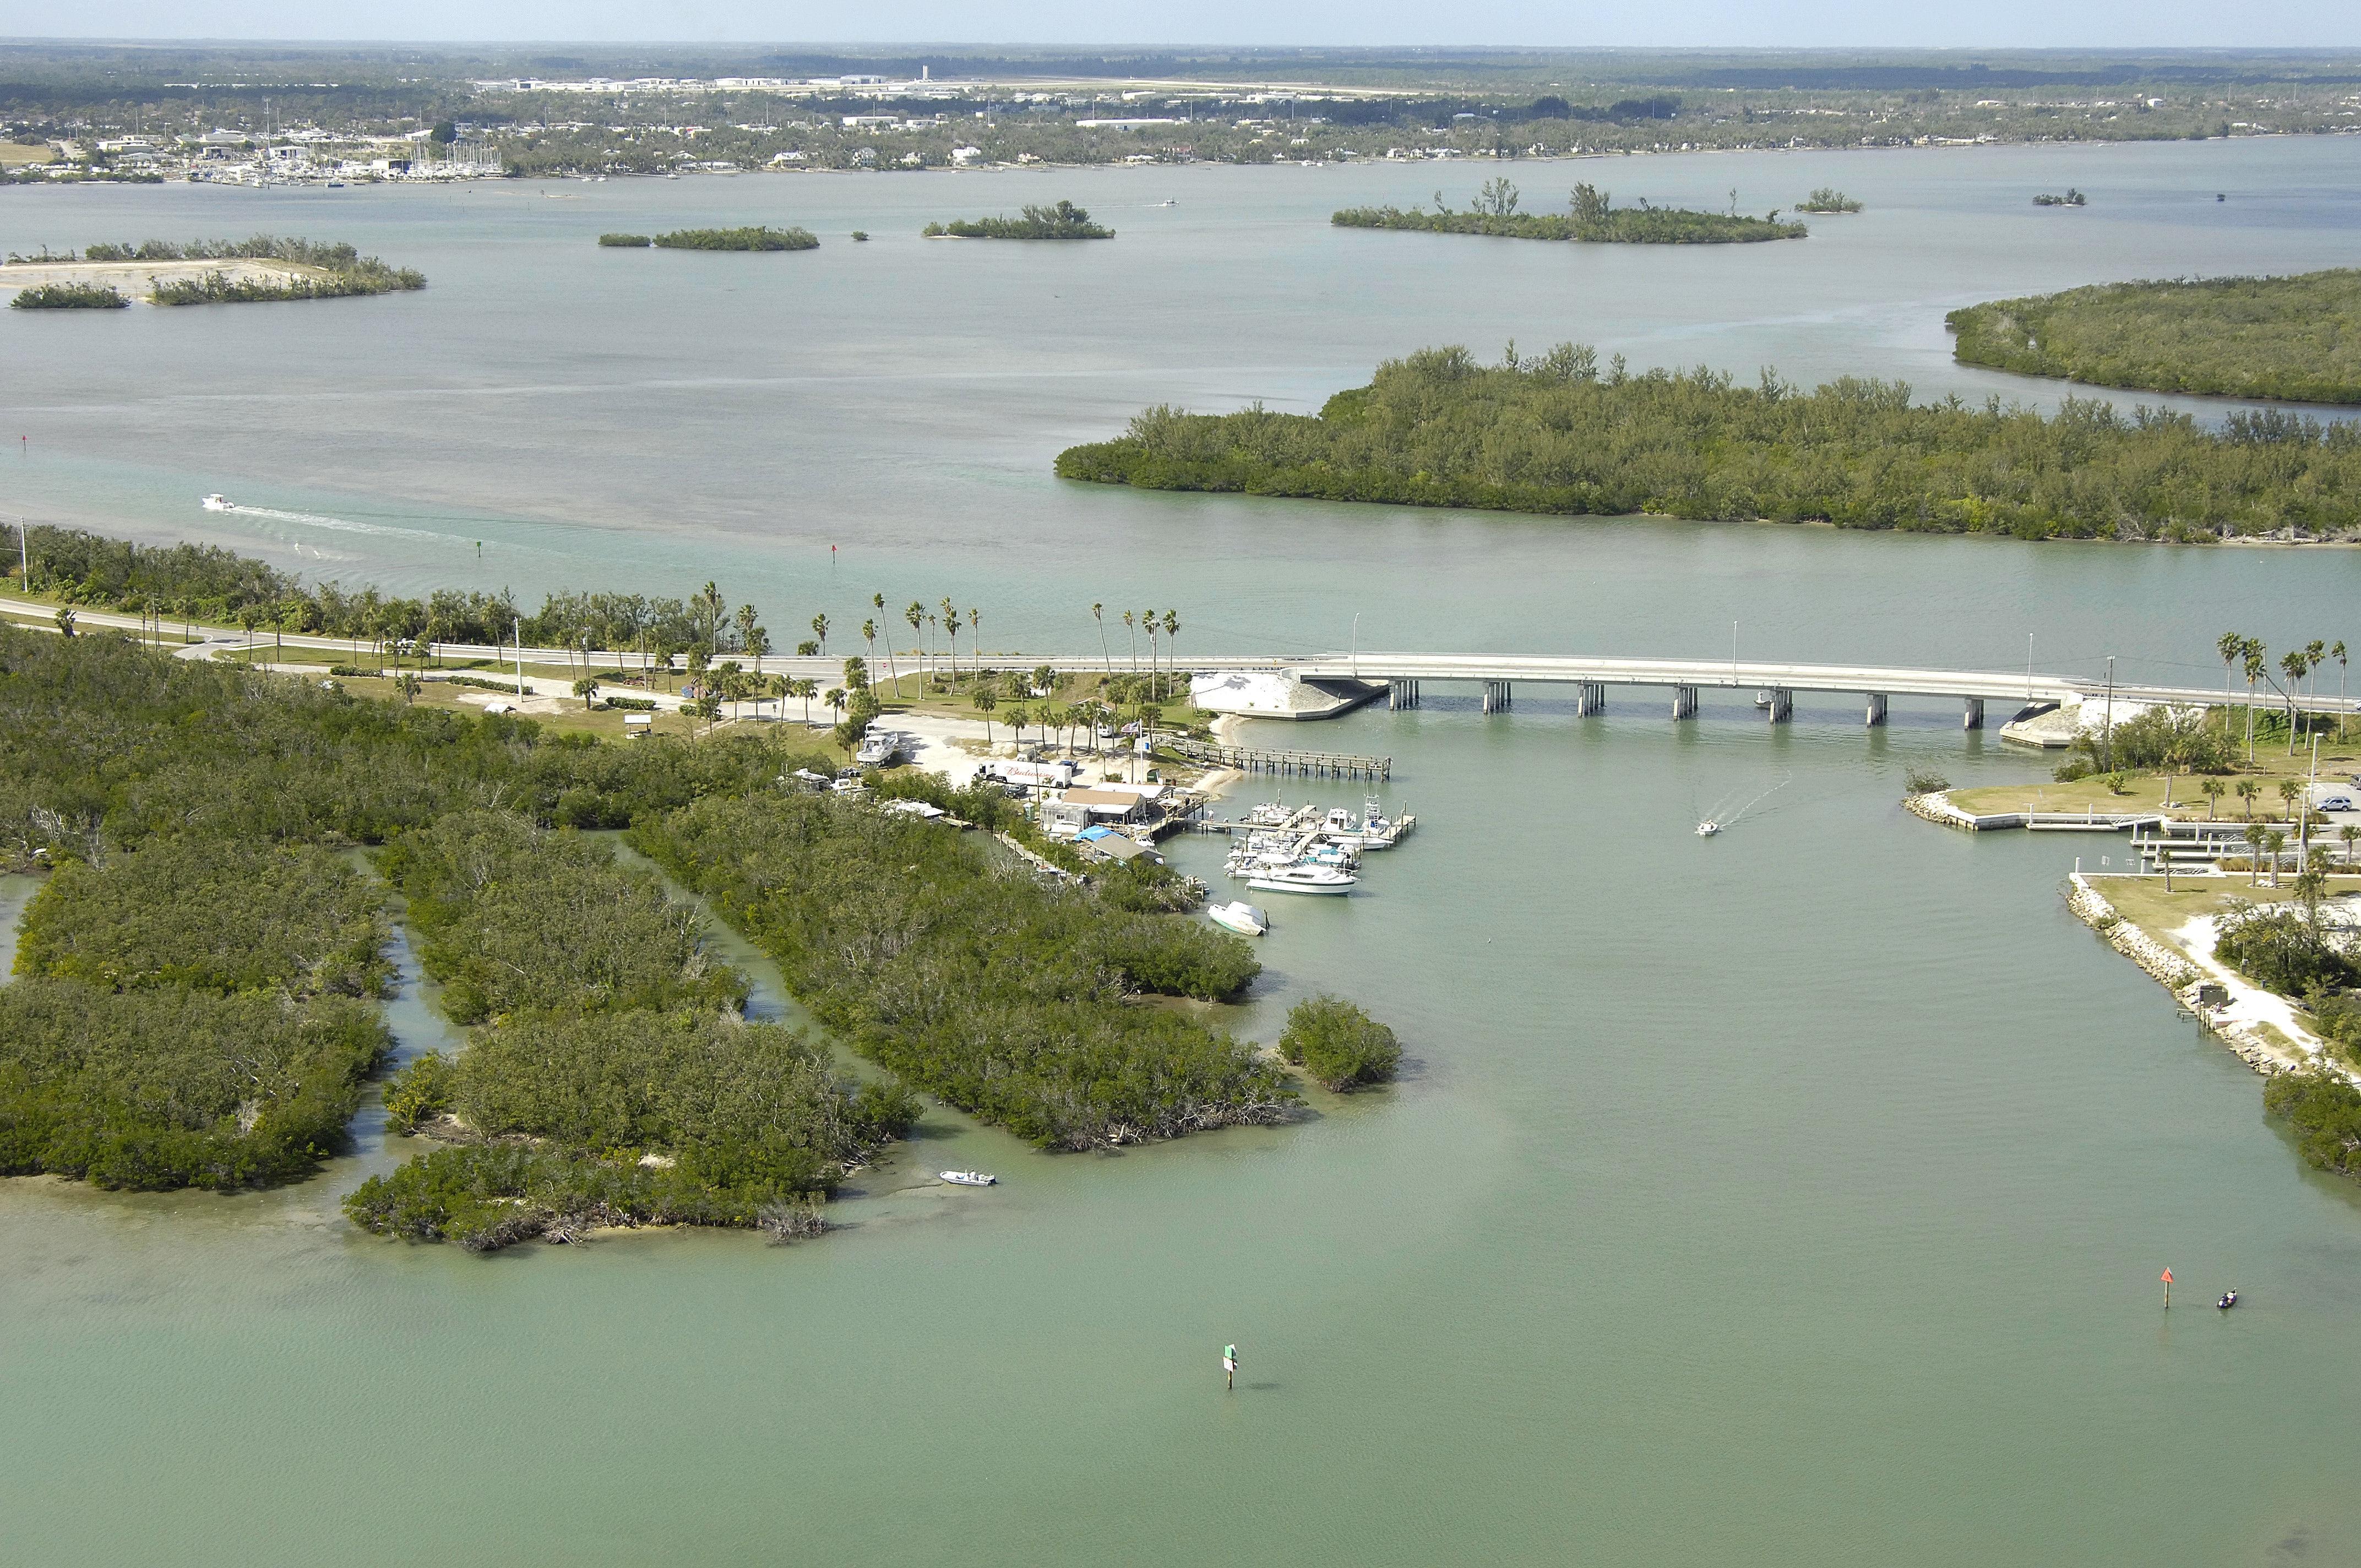 Fort Pierce to Jensen Beach: Scenic drive through Old Florida